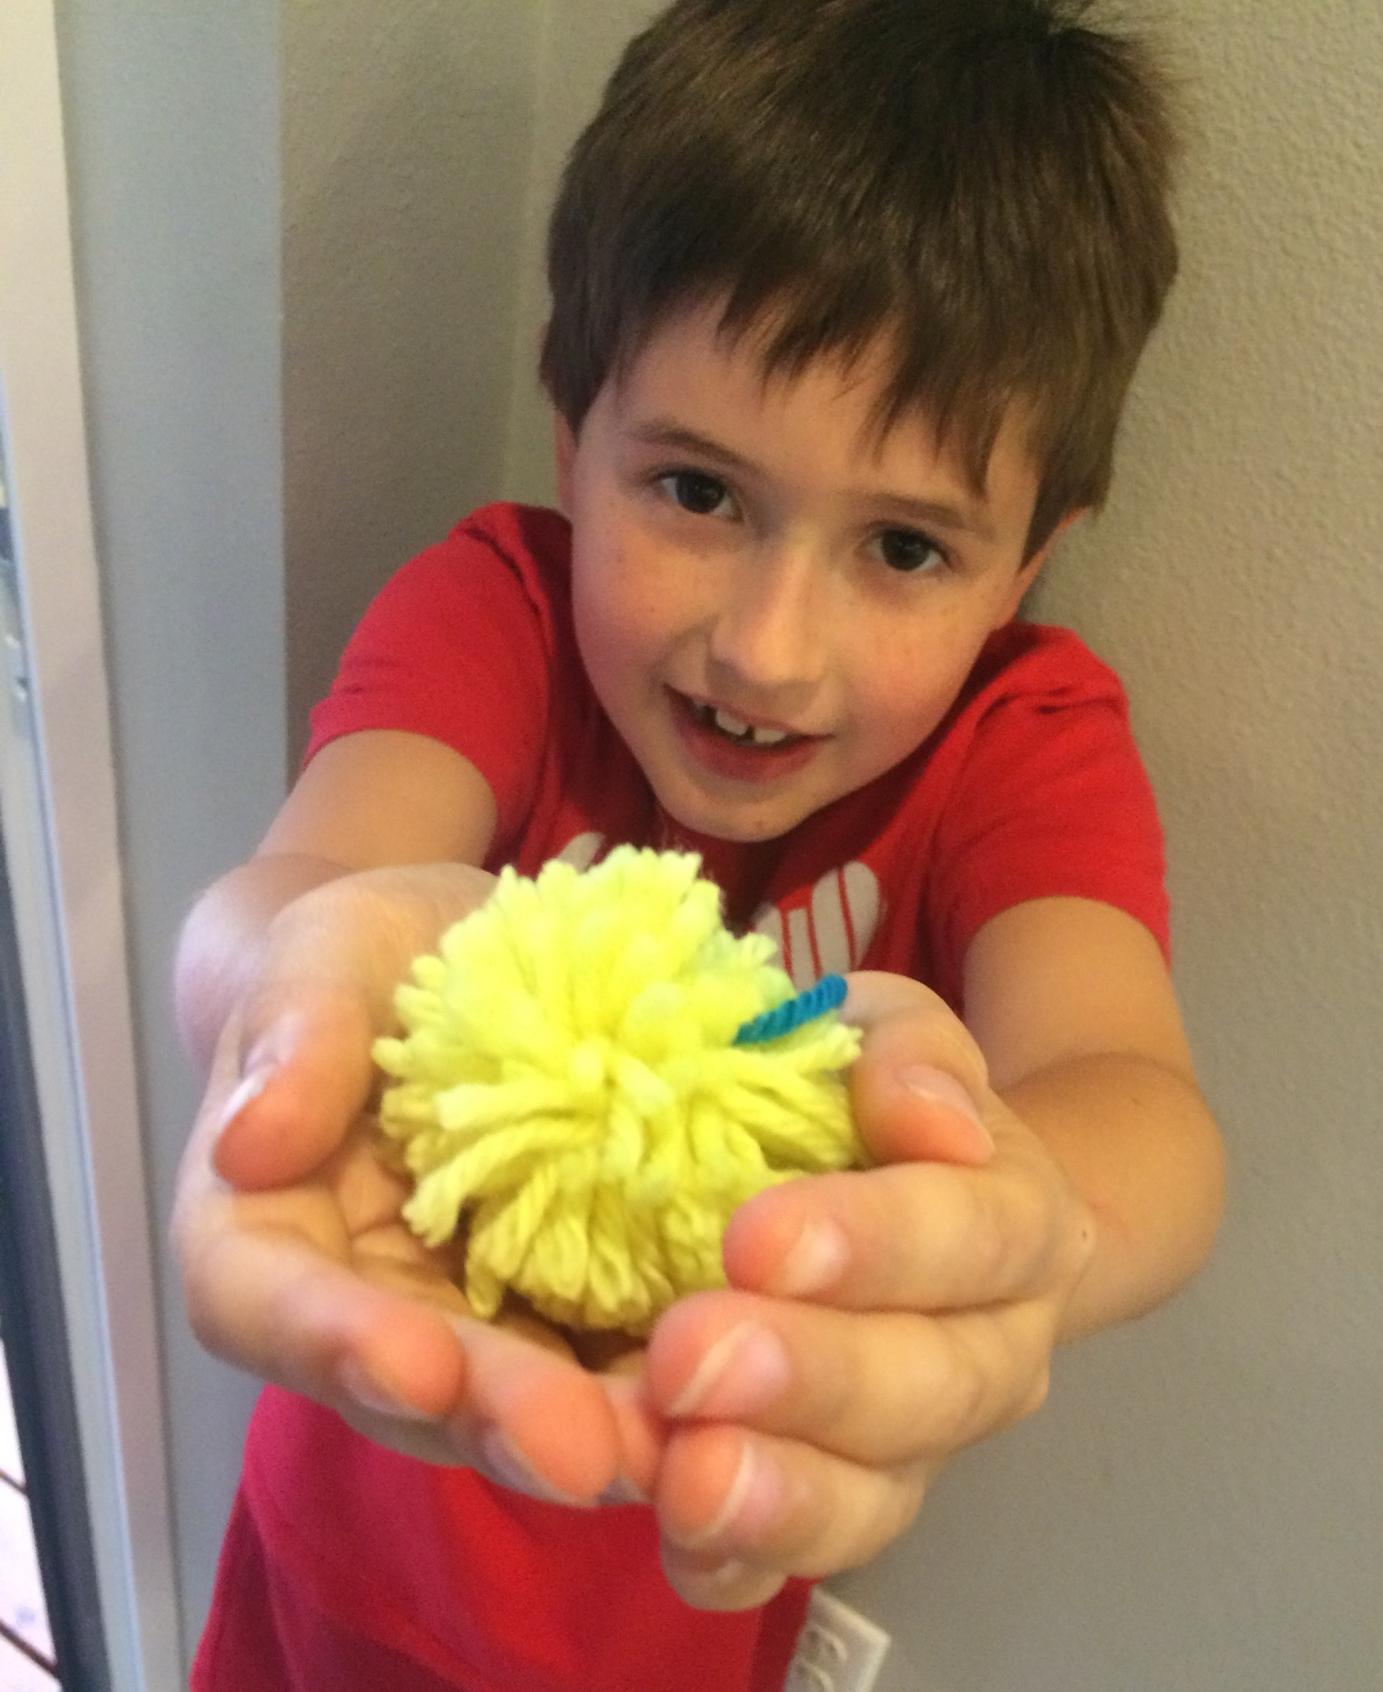 Boys love making pompoms, too.